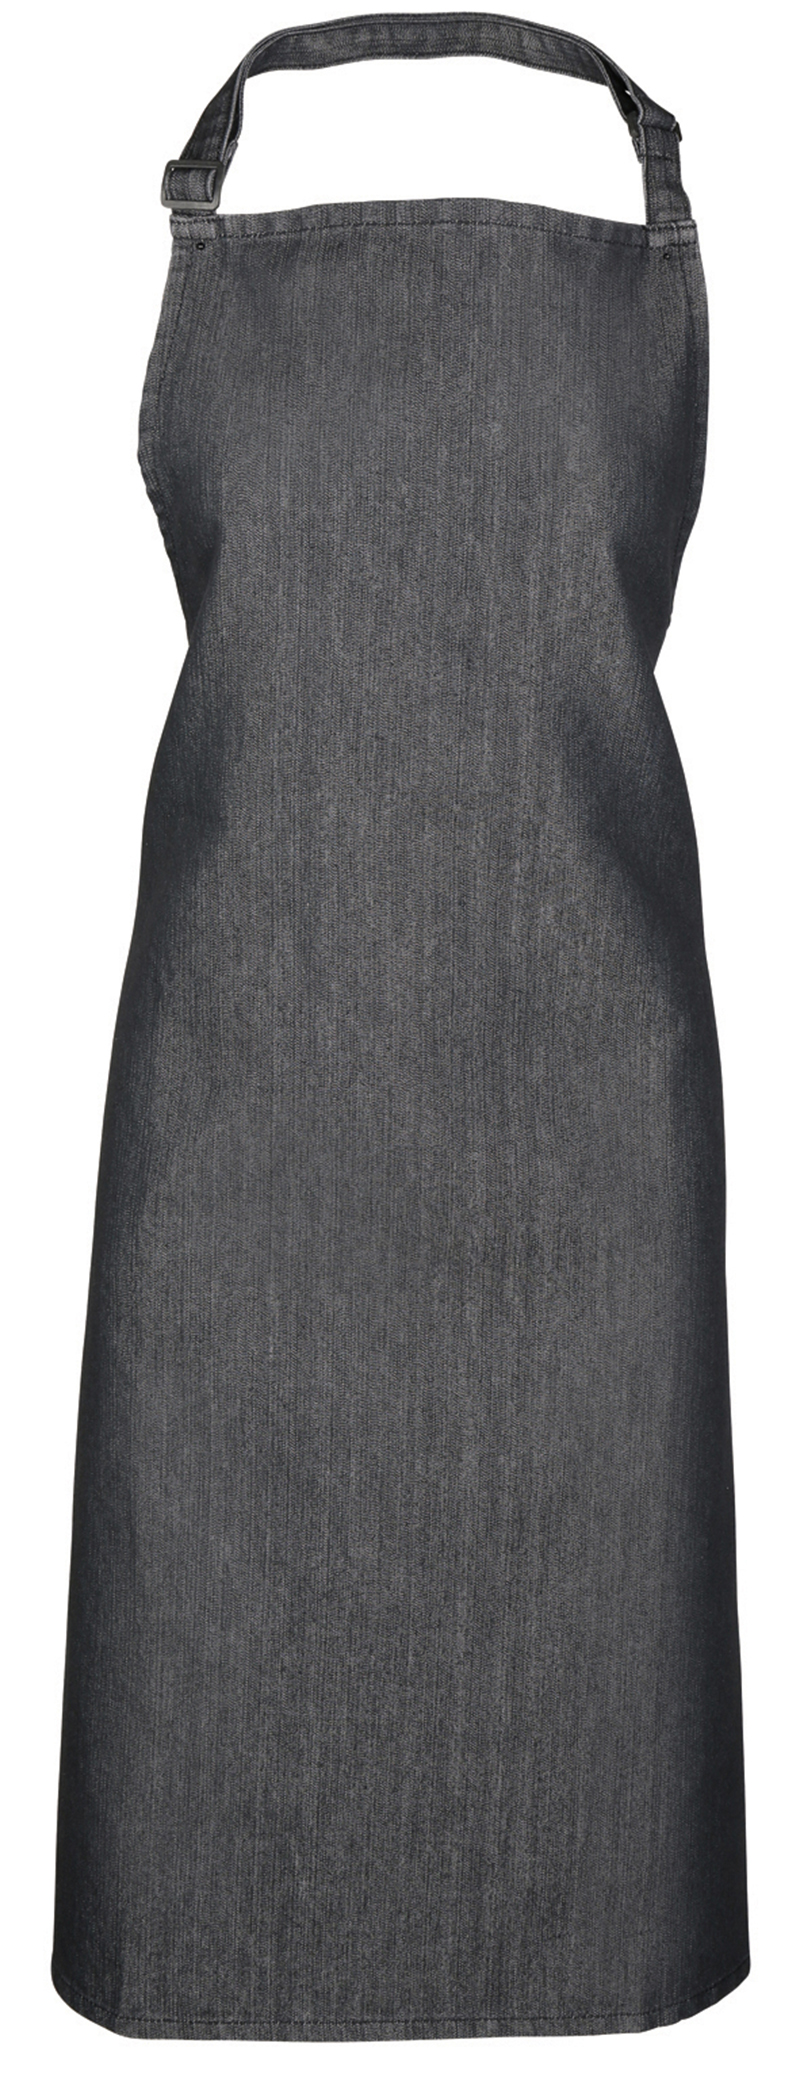 White apron ebay.ca - Premier Colours Bib Apron Sliding Adjusting Buckle Pr150